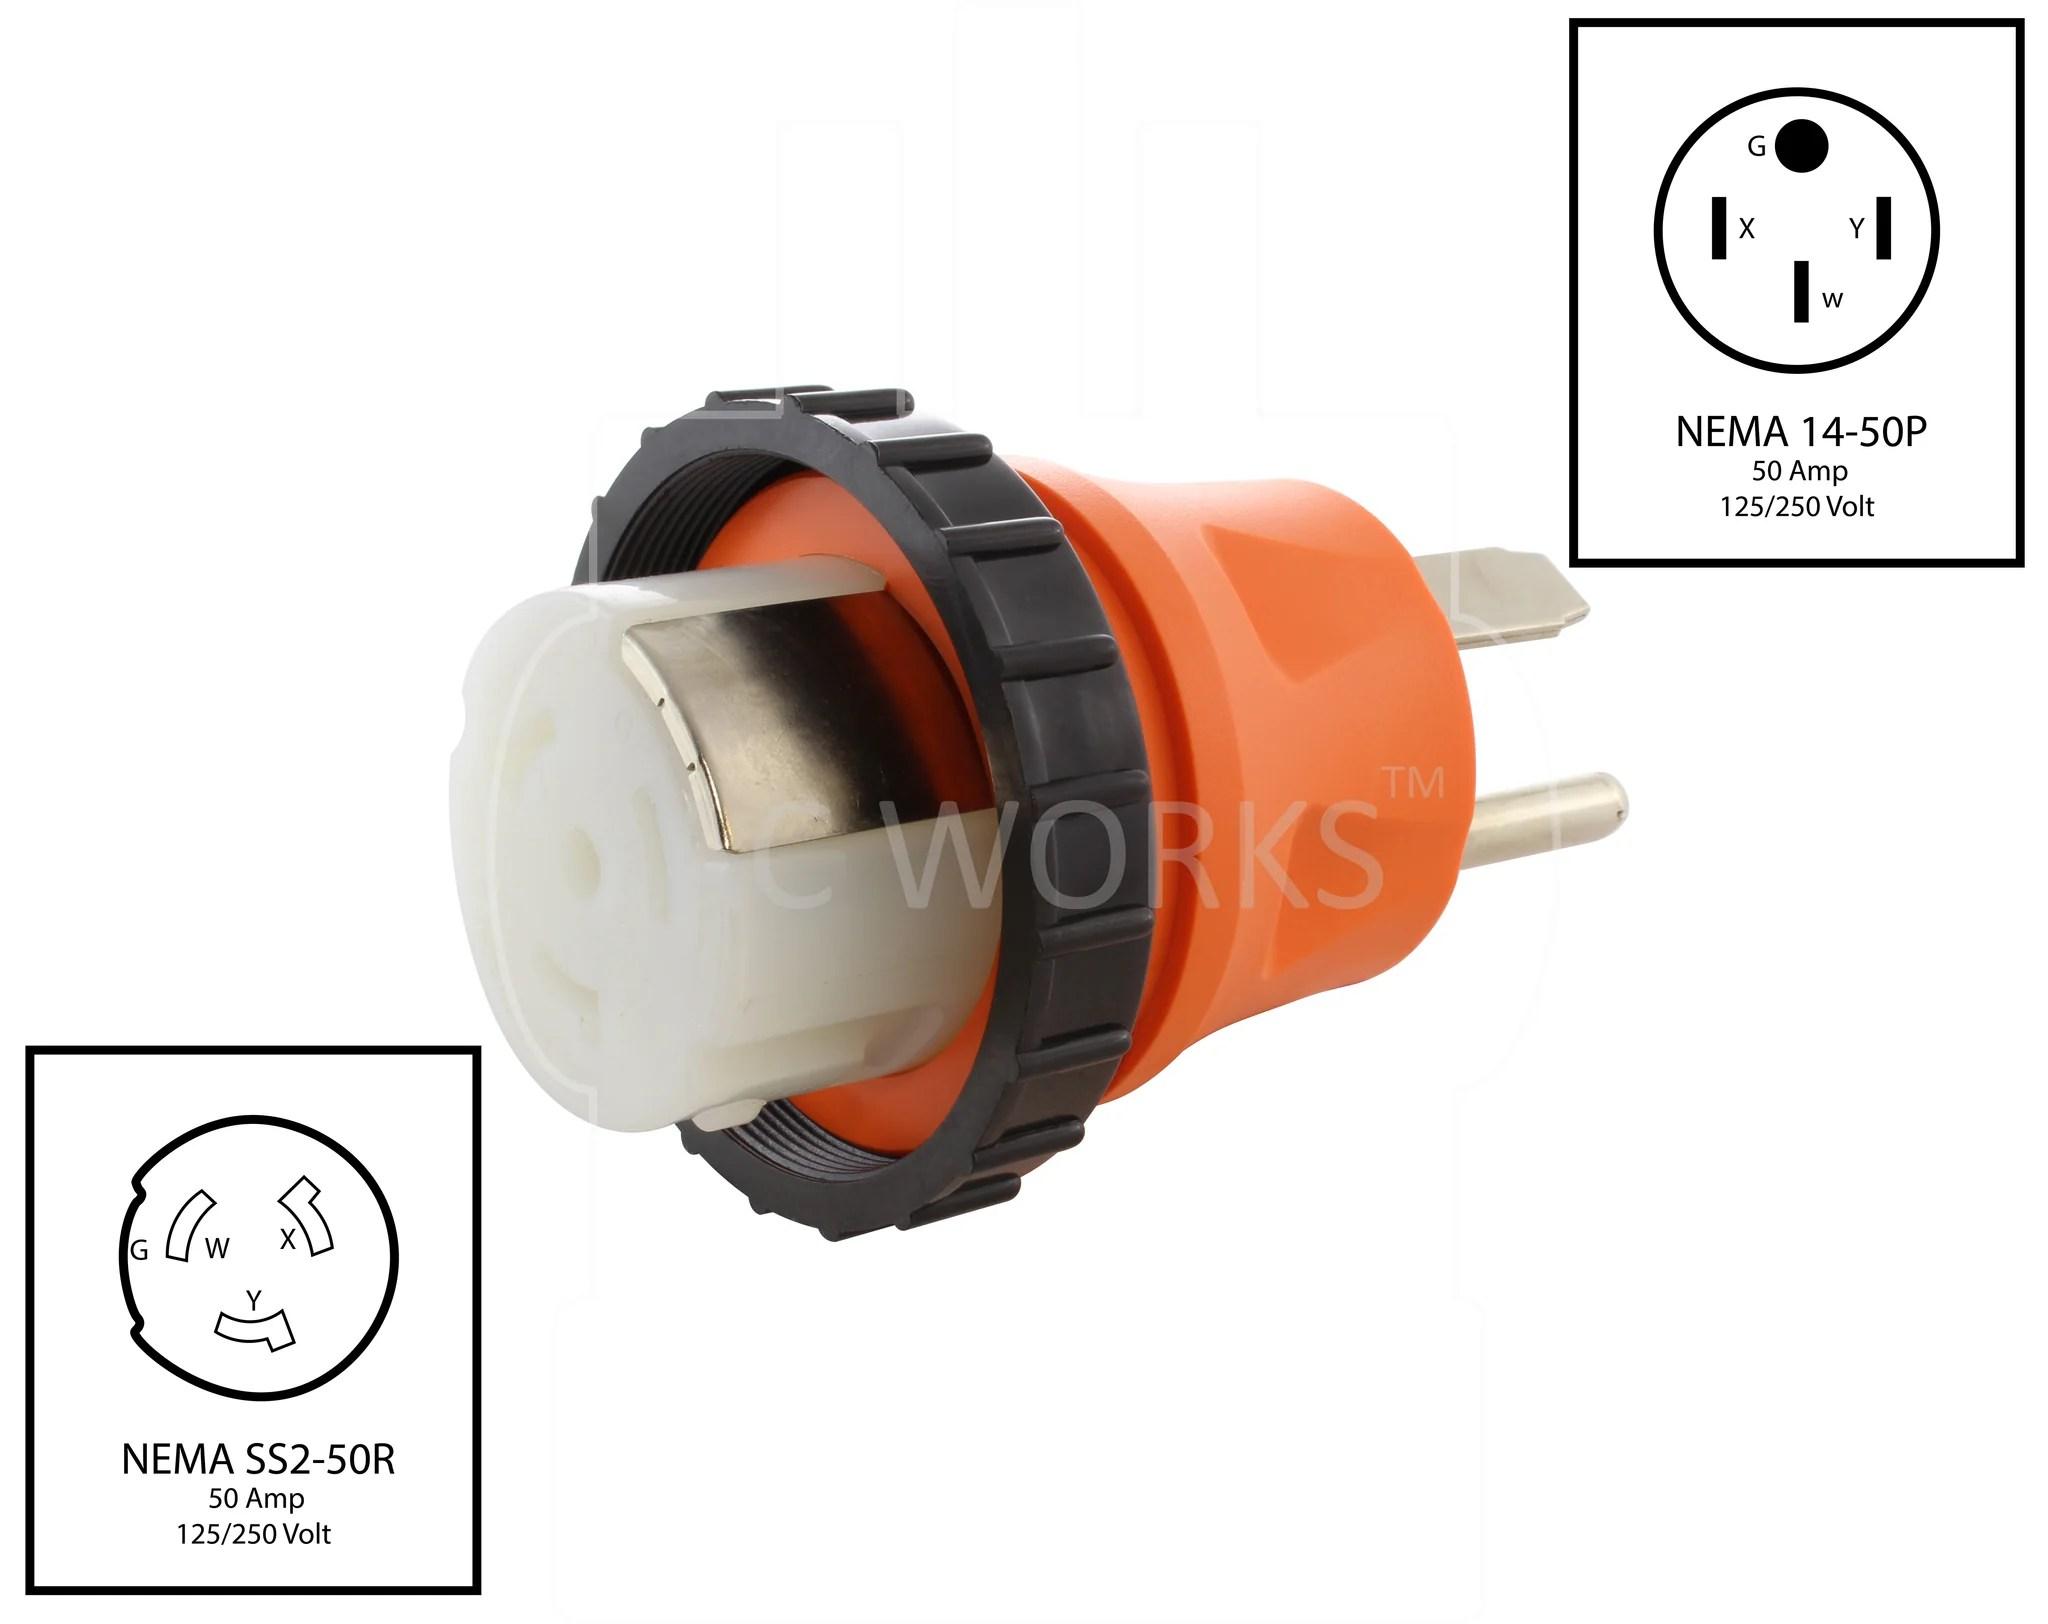 small resolution of  nema 14 50p to nema ss2 50r 50 amp adapter 50 amp